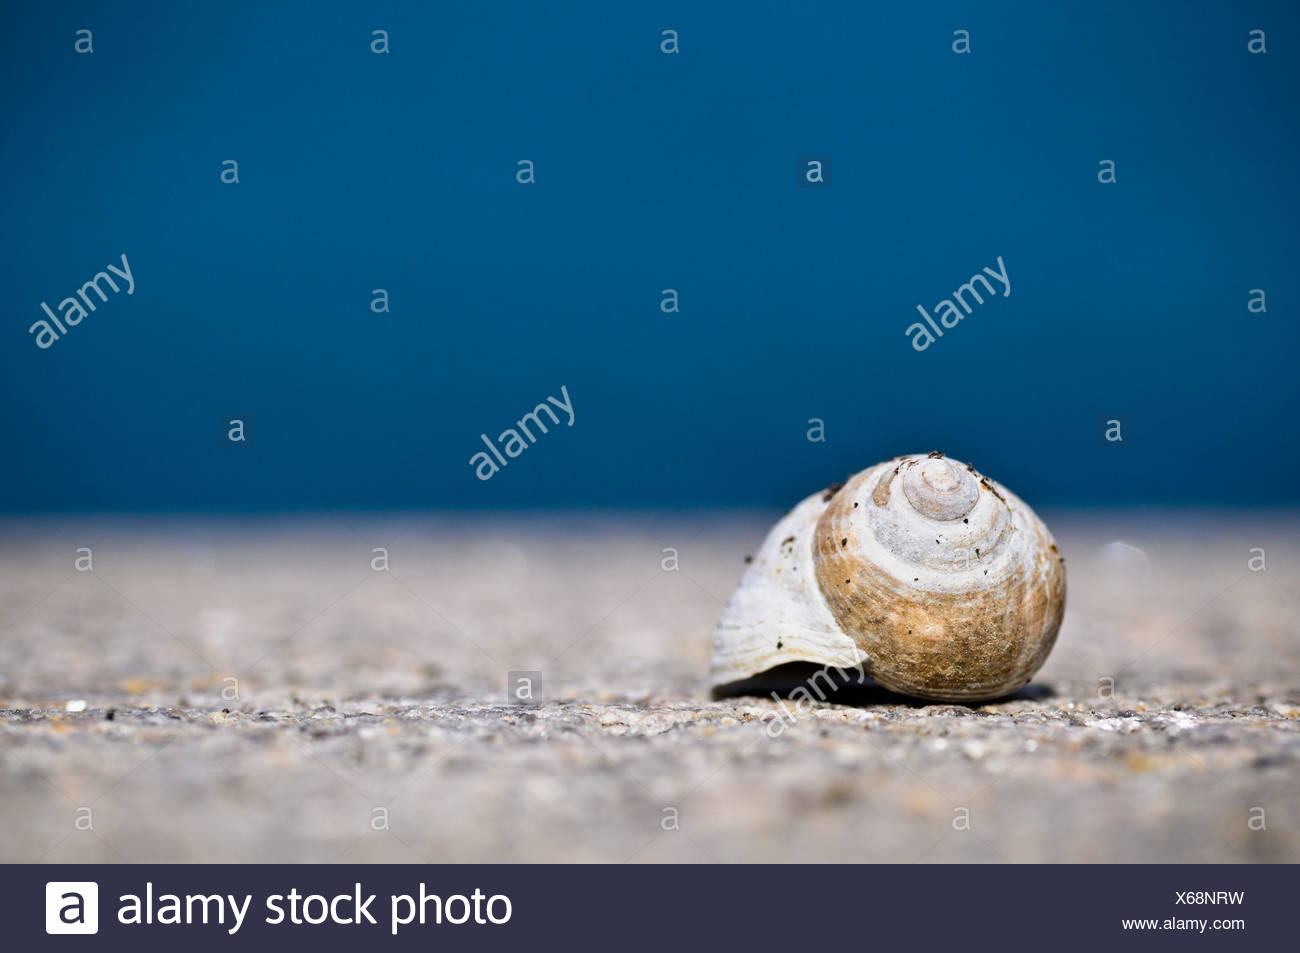 Snail - Stock Image